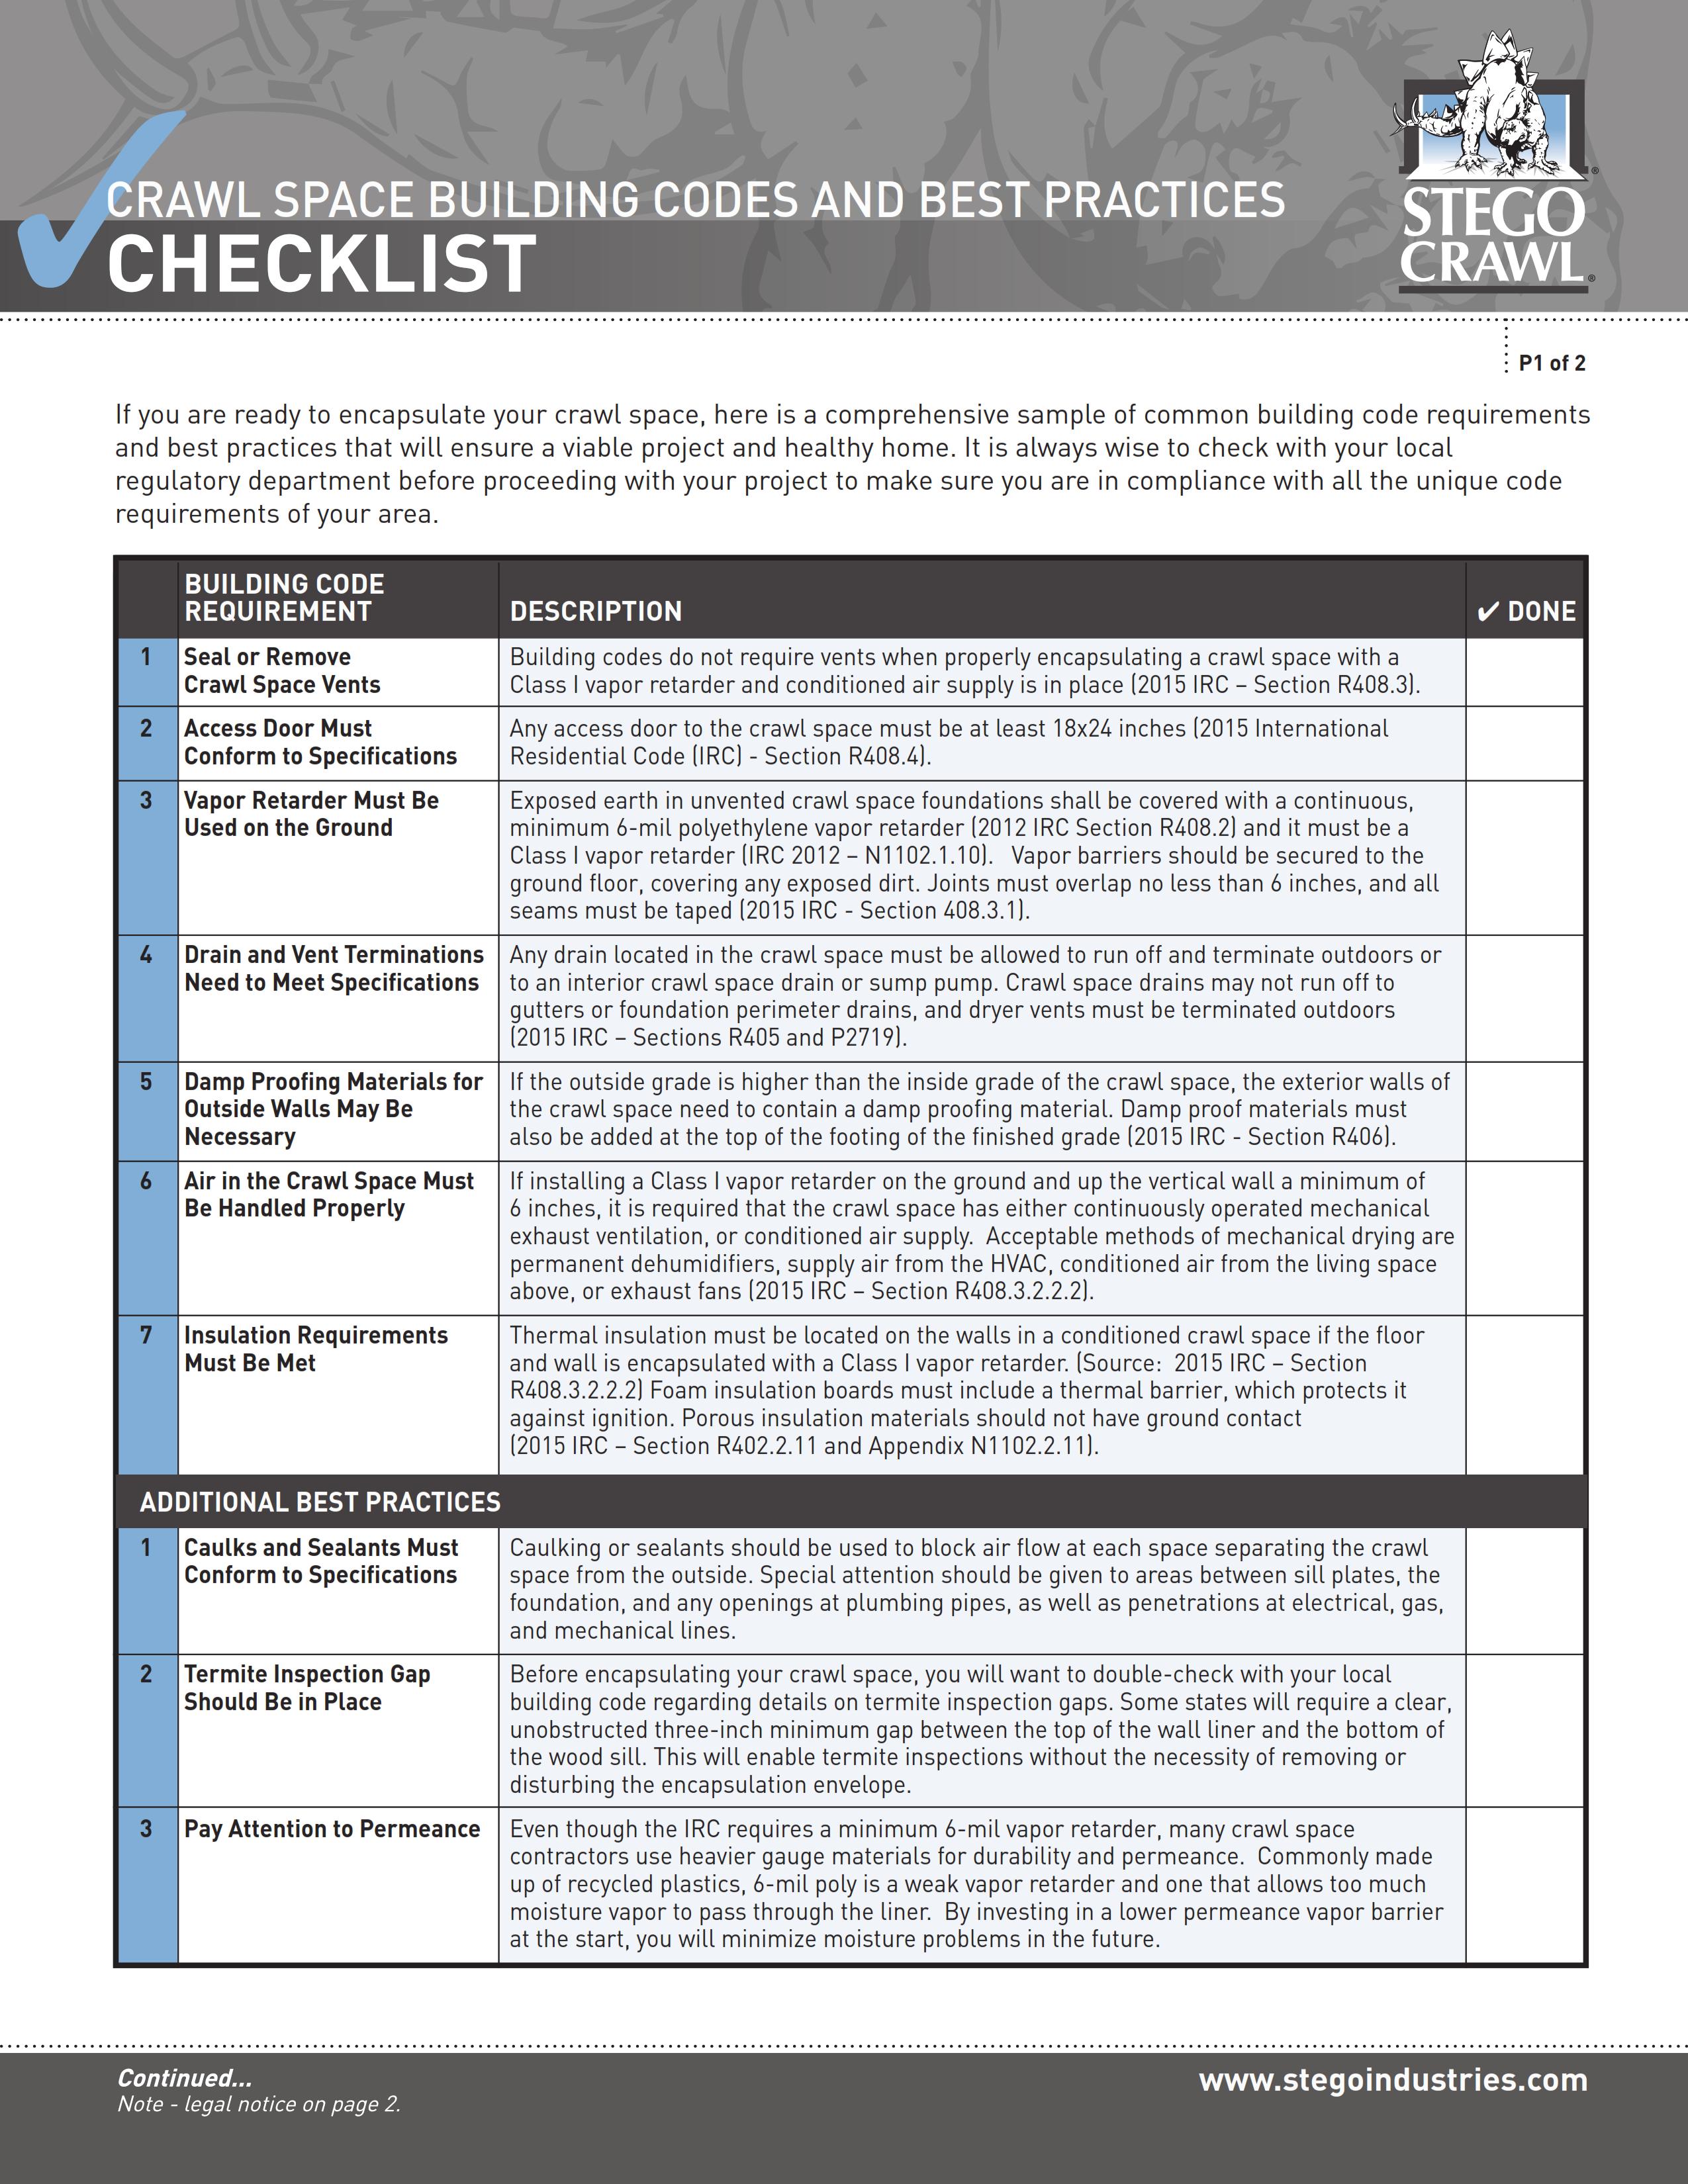 Stego-Crawl-Building-Code-Checklist-Doc_001.png